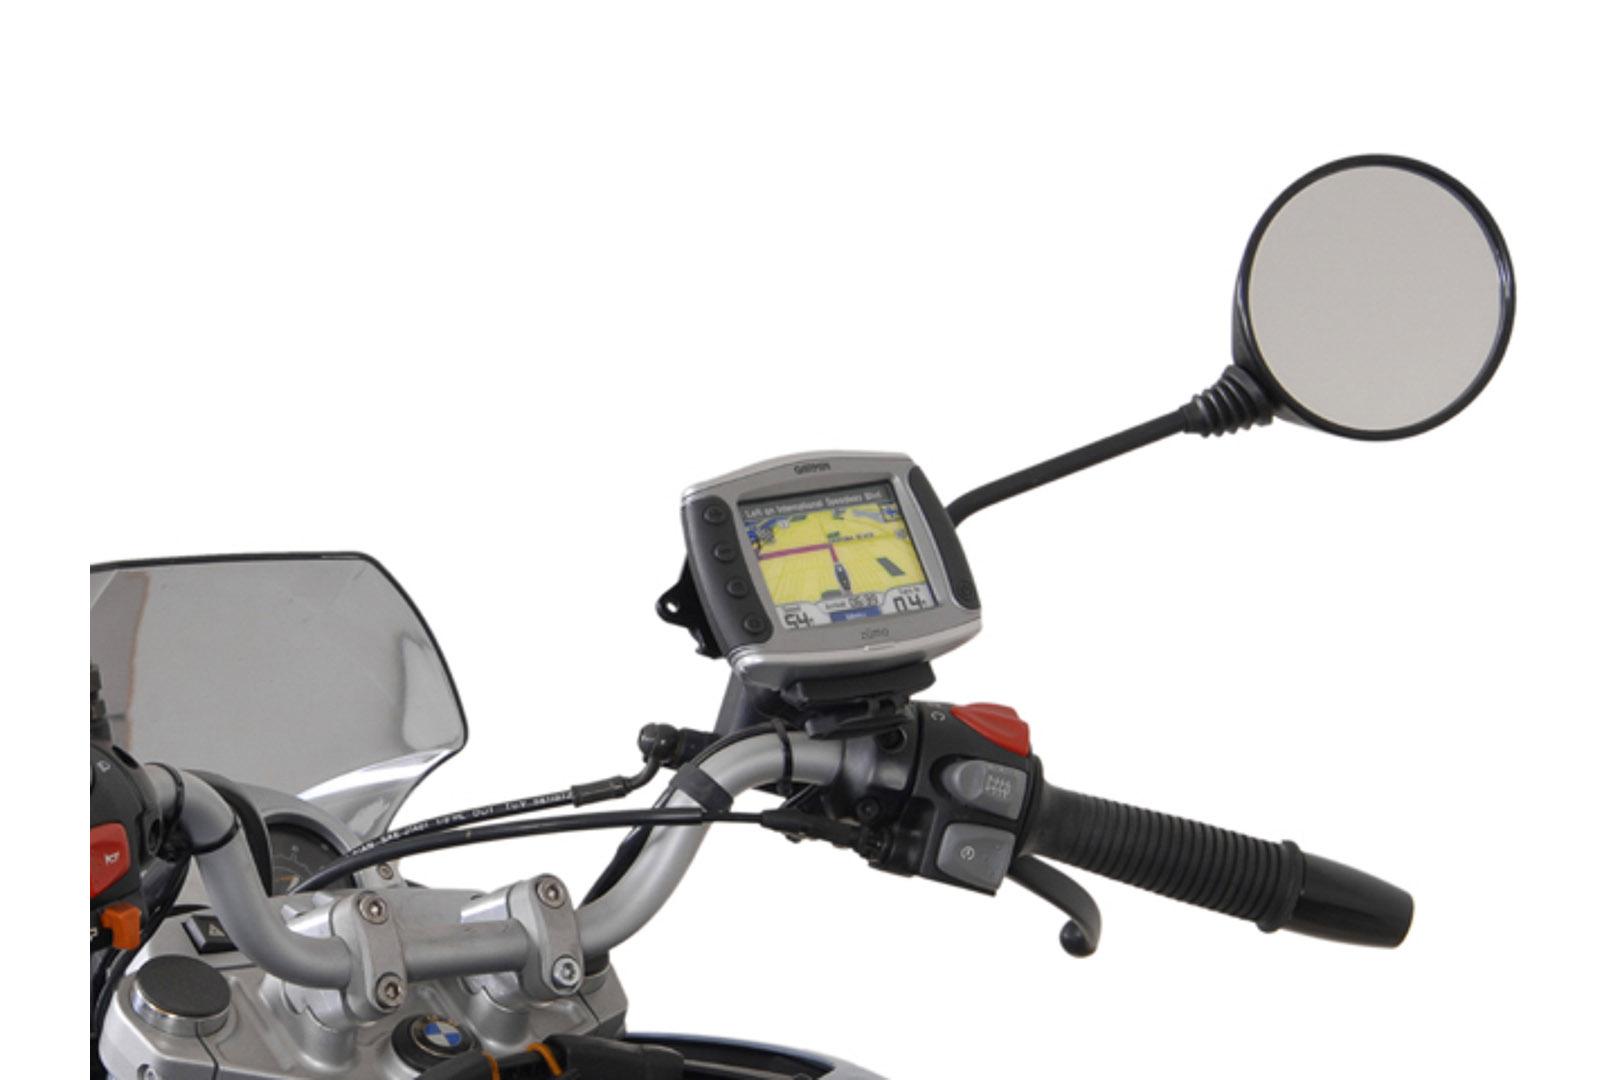 RAM-kuula peilinvarteen (GPS-telineelle)